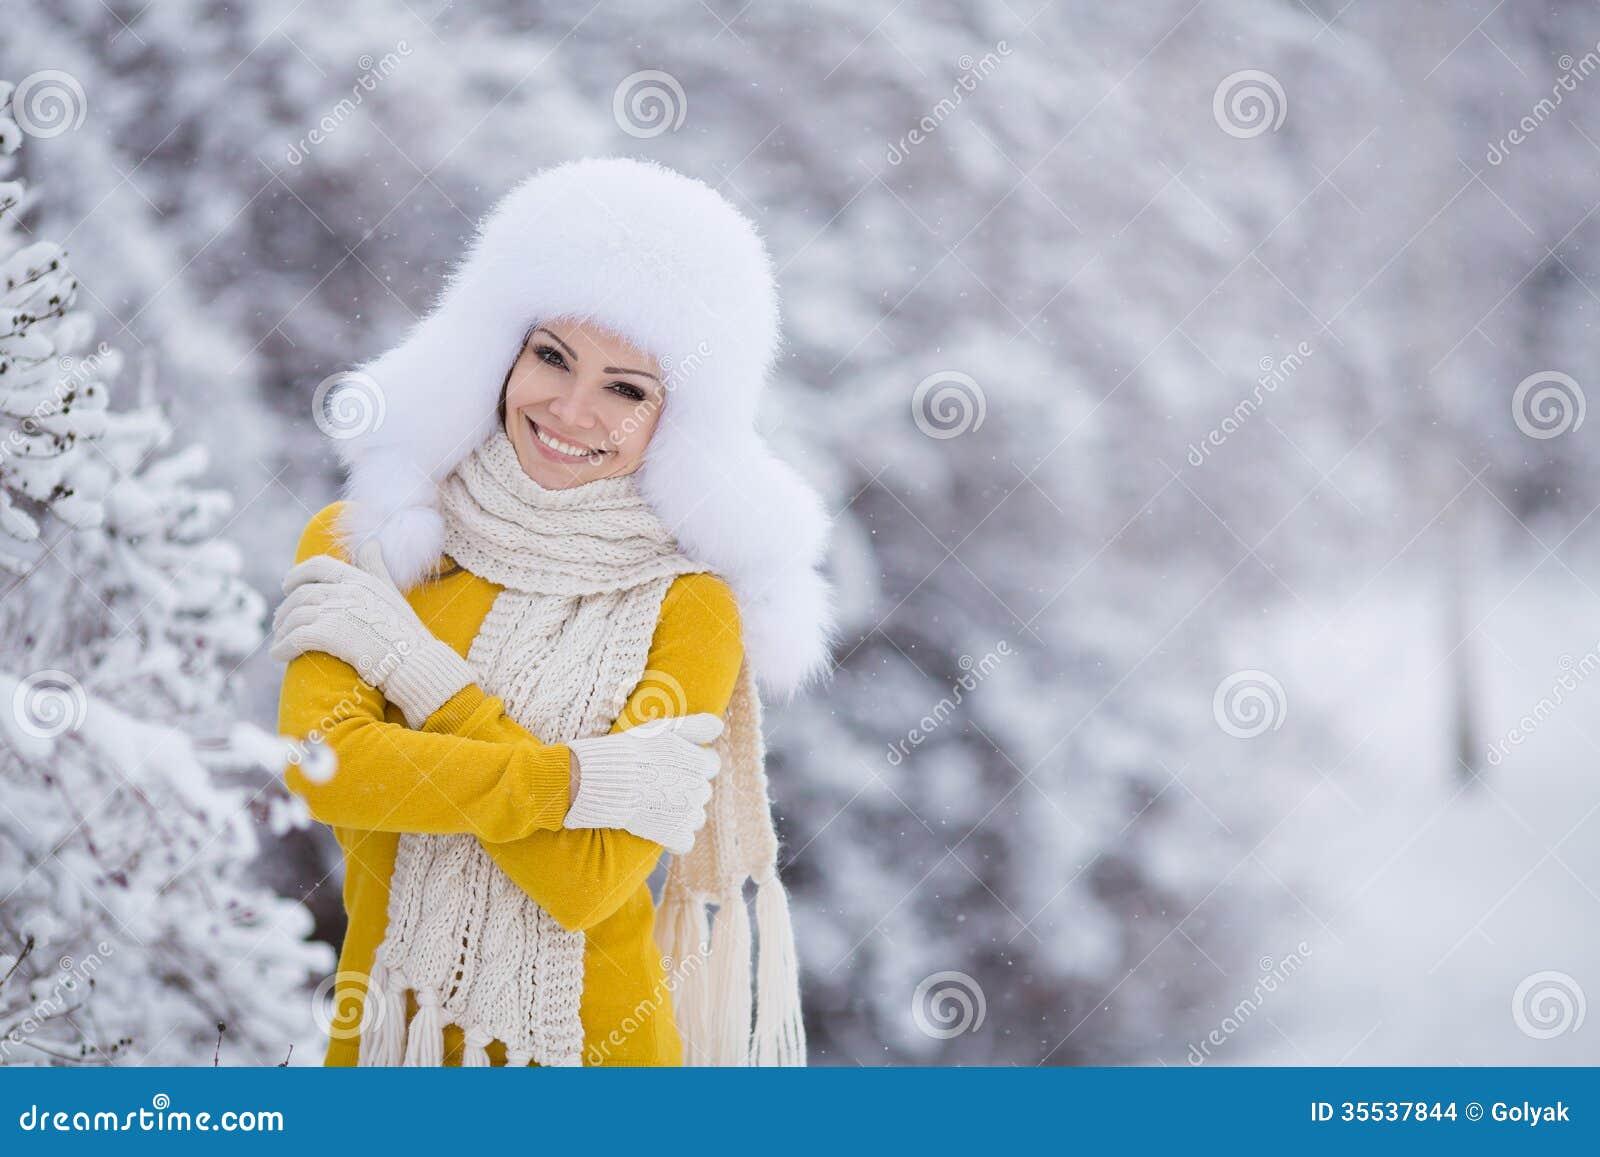 White Fluffy Christmas Tree